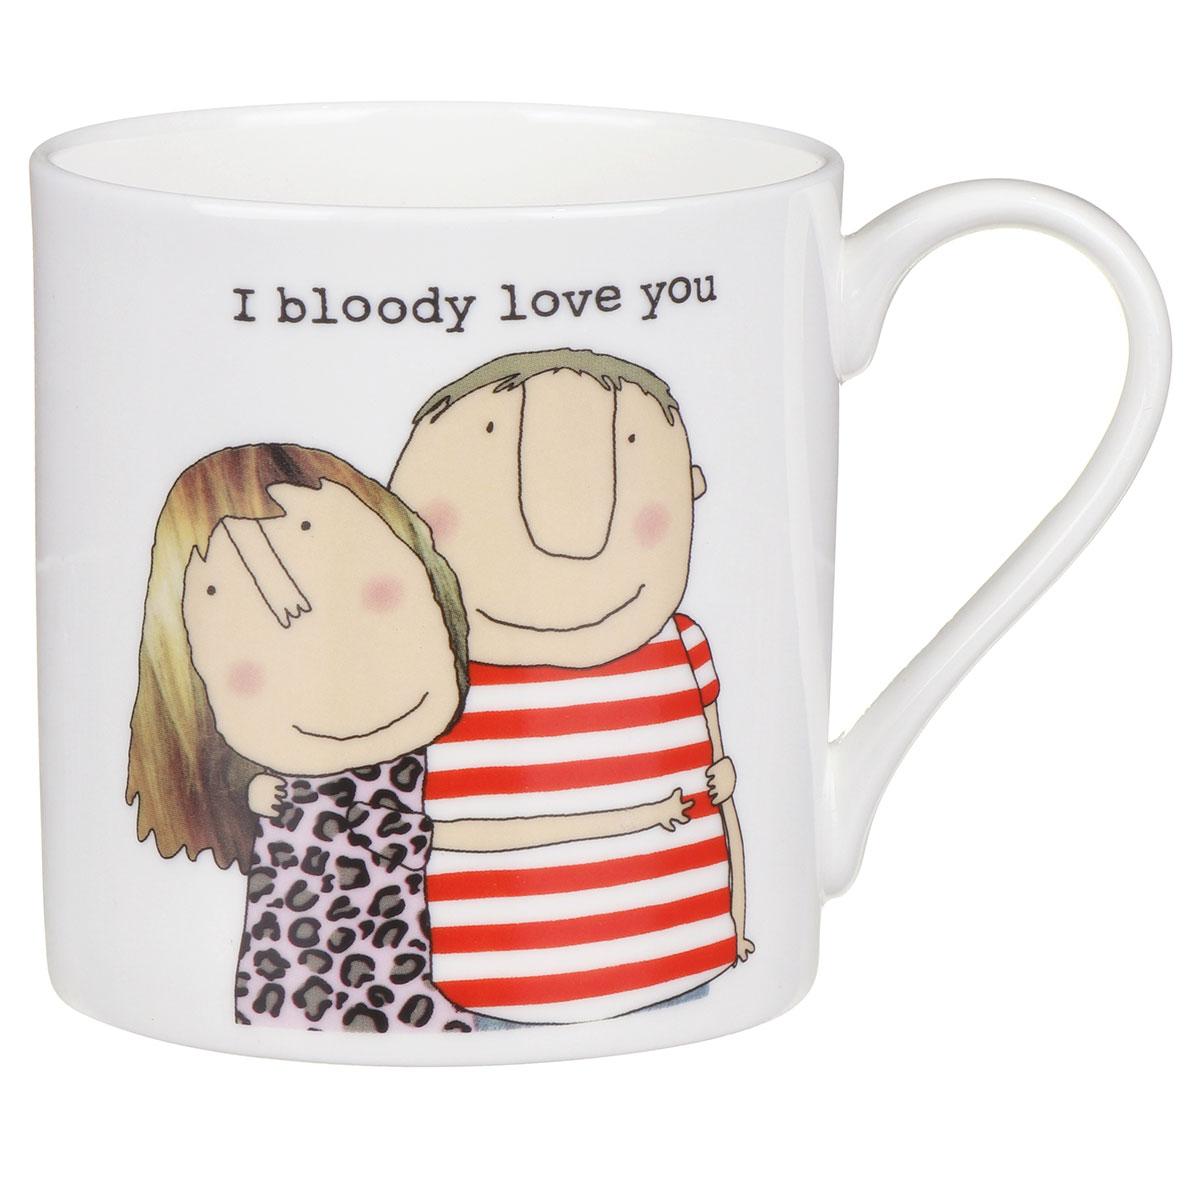 Rosie Made A Thing I Bloody Love You Mug